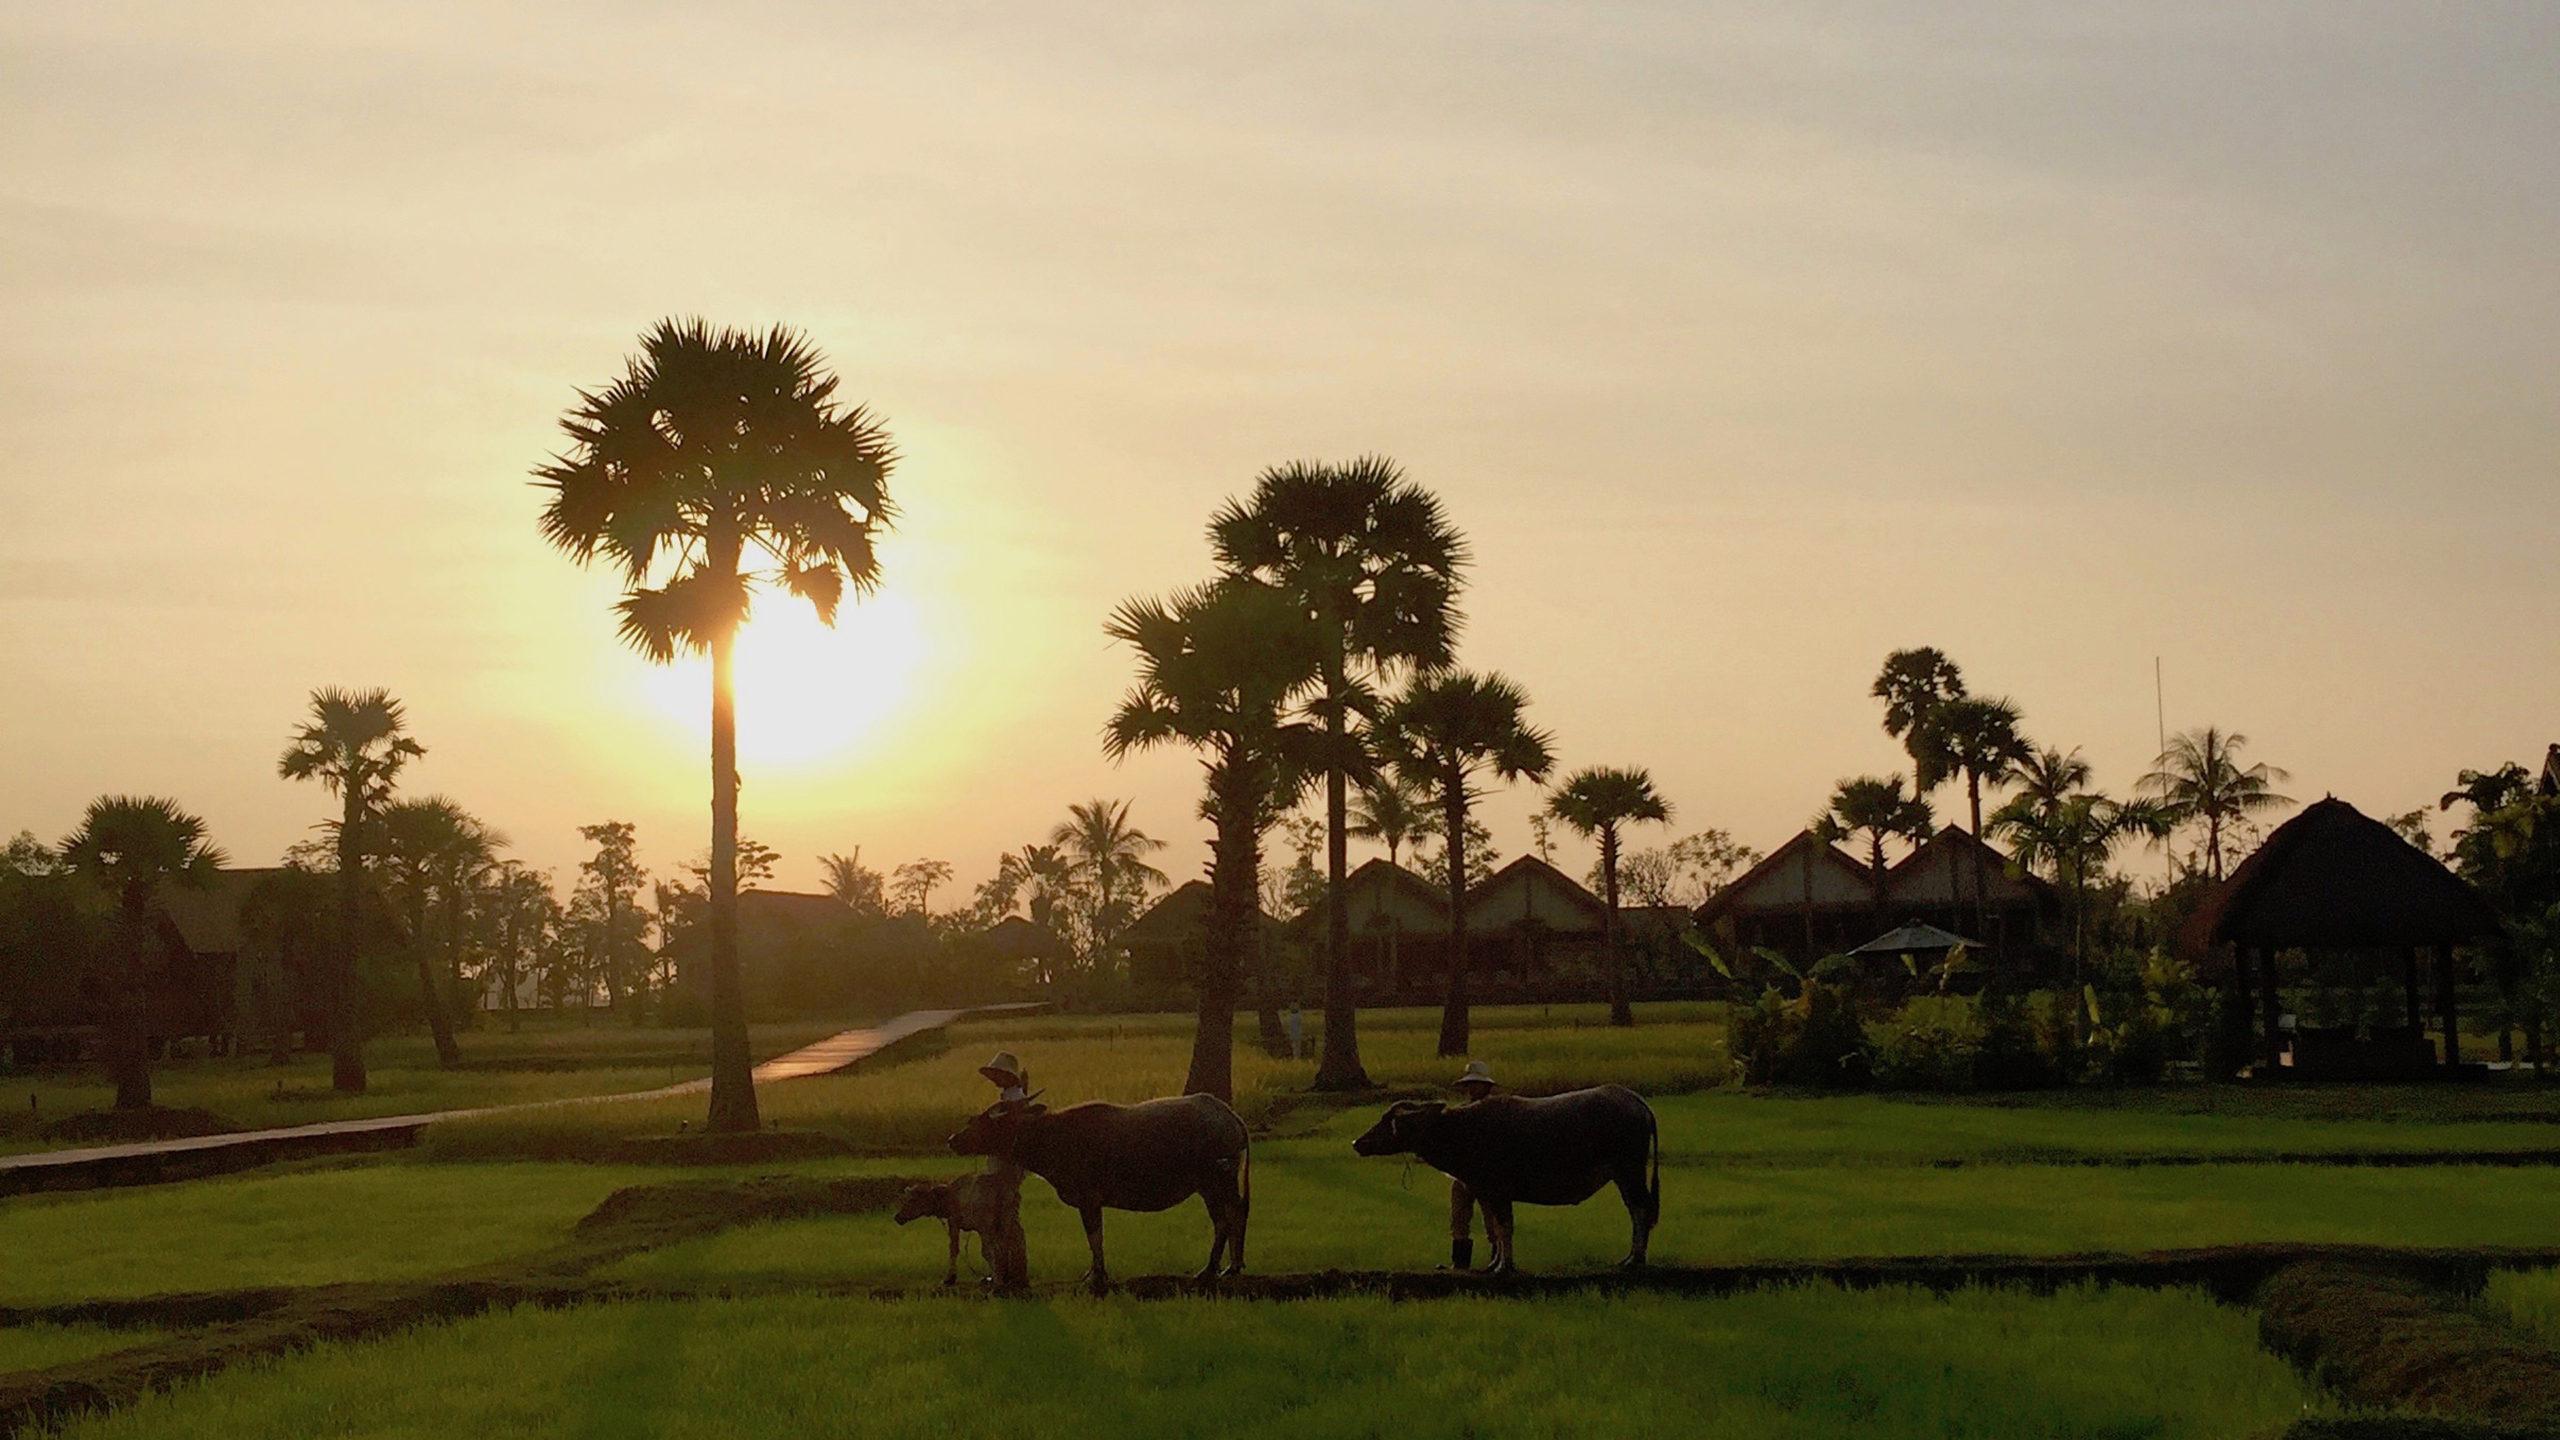 bestemming cambodja charmant mysterieus en luxe